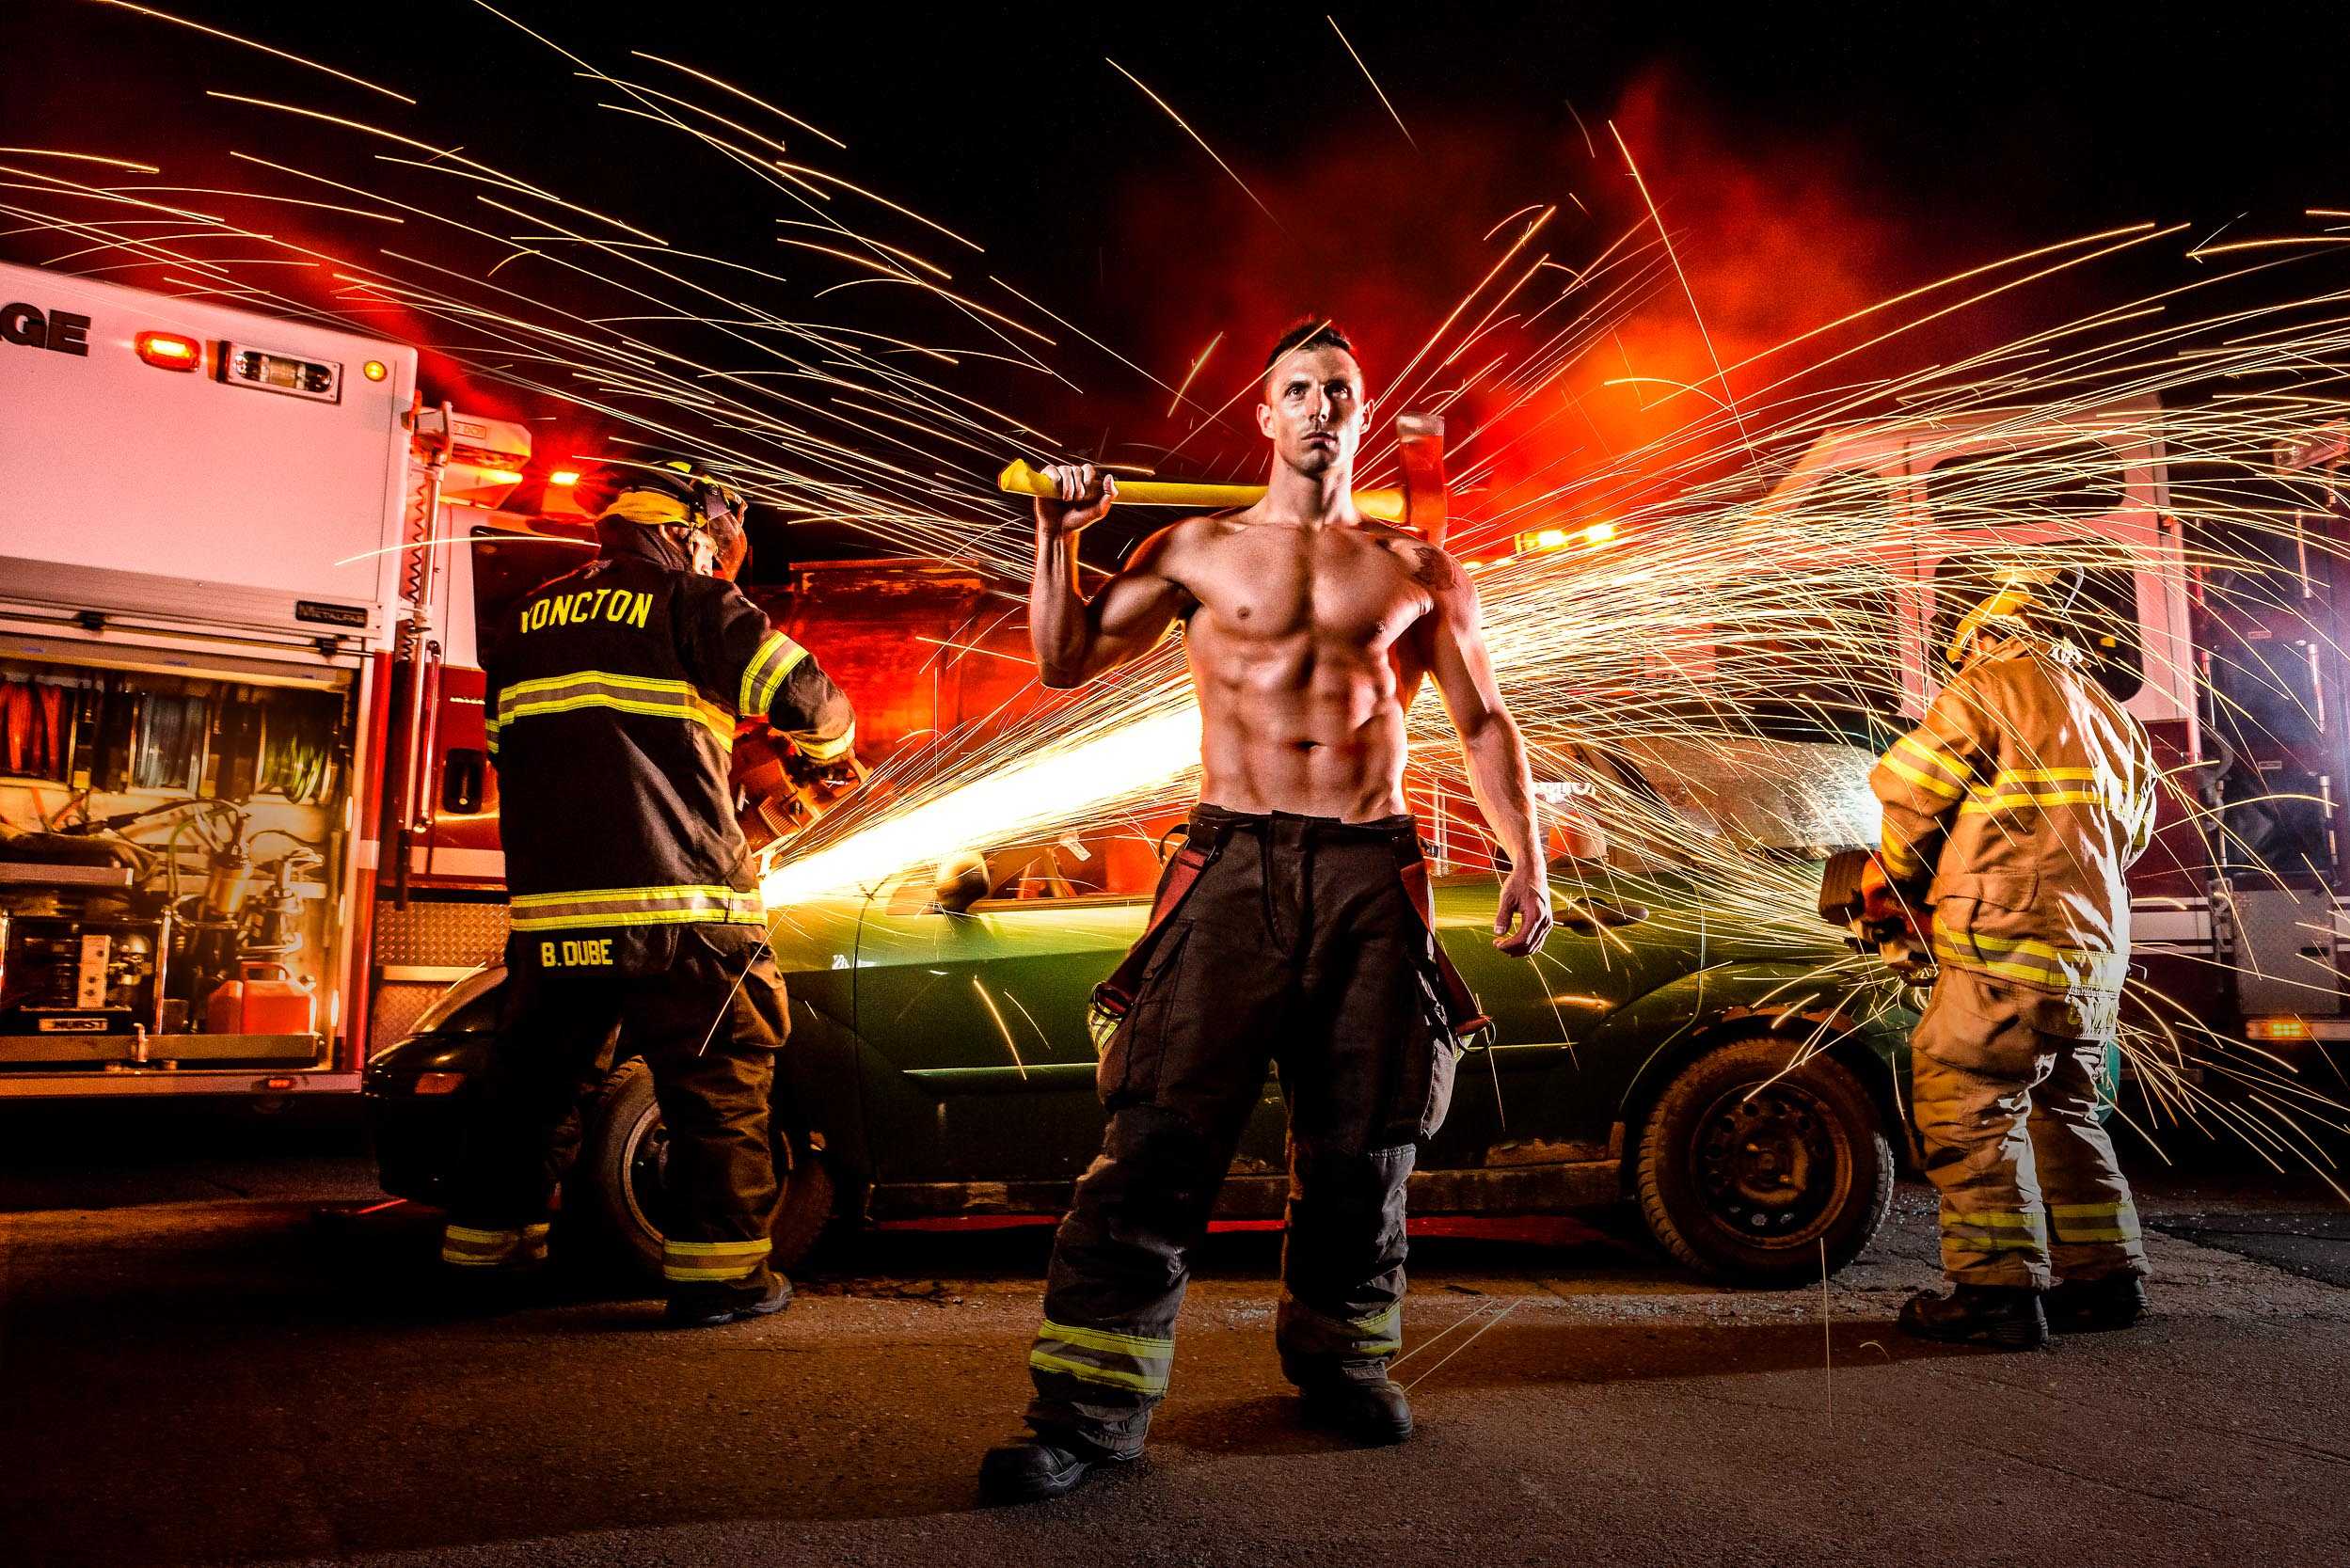 Nigel Fearon Photography | 2016 Moncton Firefighter Calendar-21.jpg